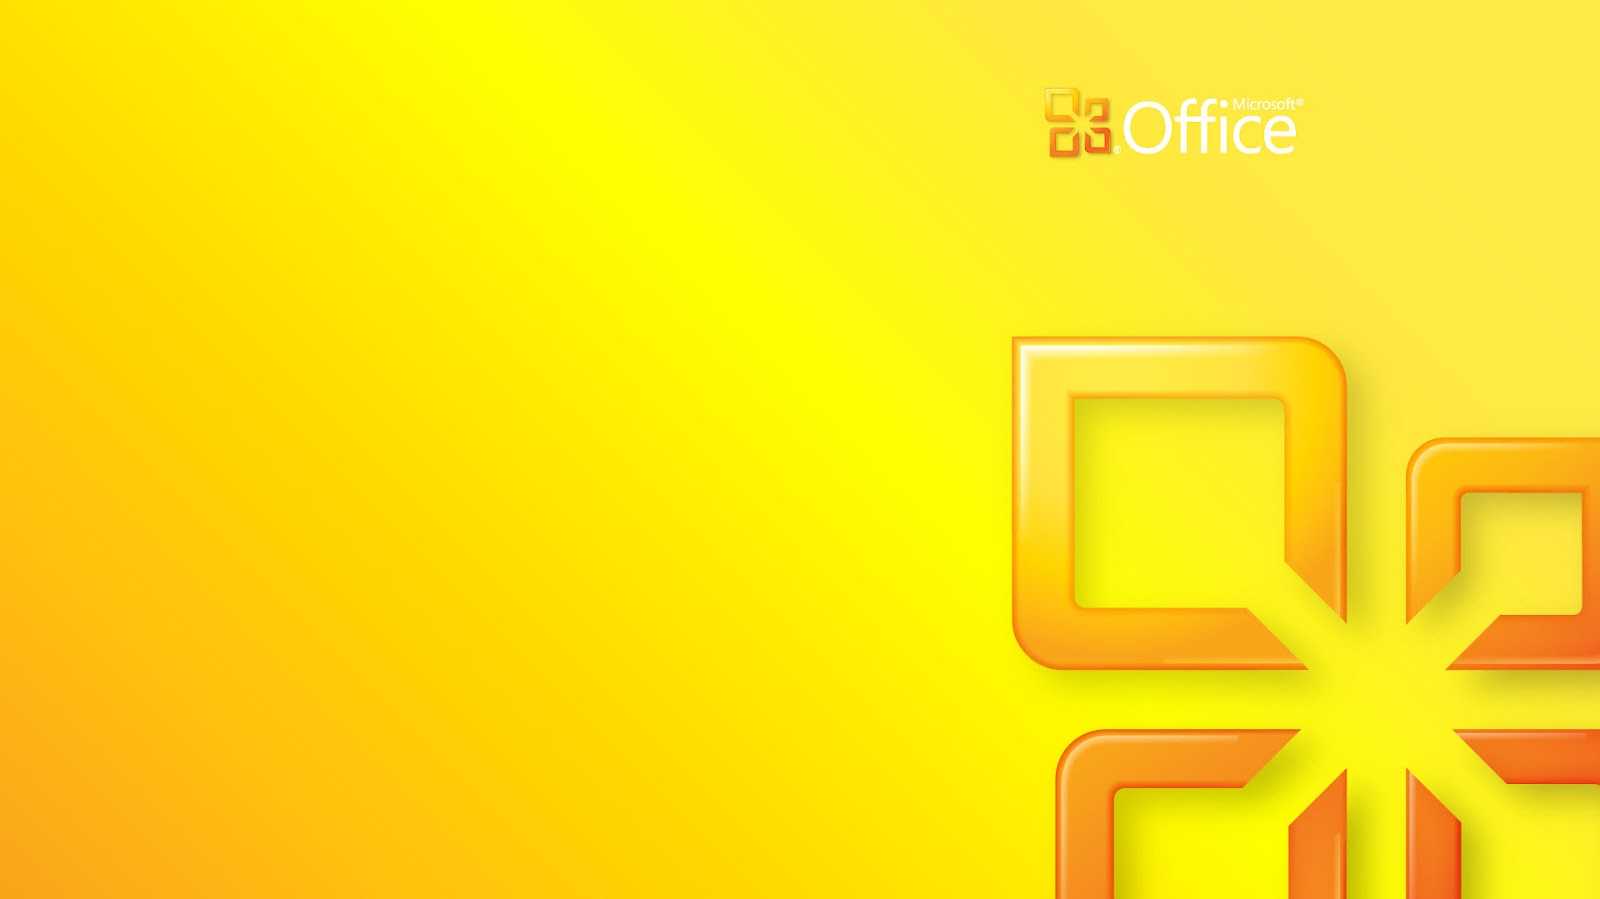 1600x899px Microsoft Office Desktop Wallpaper Wallpapersafari